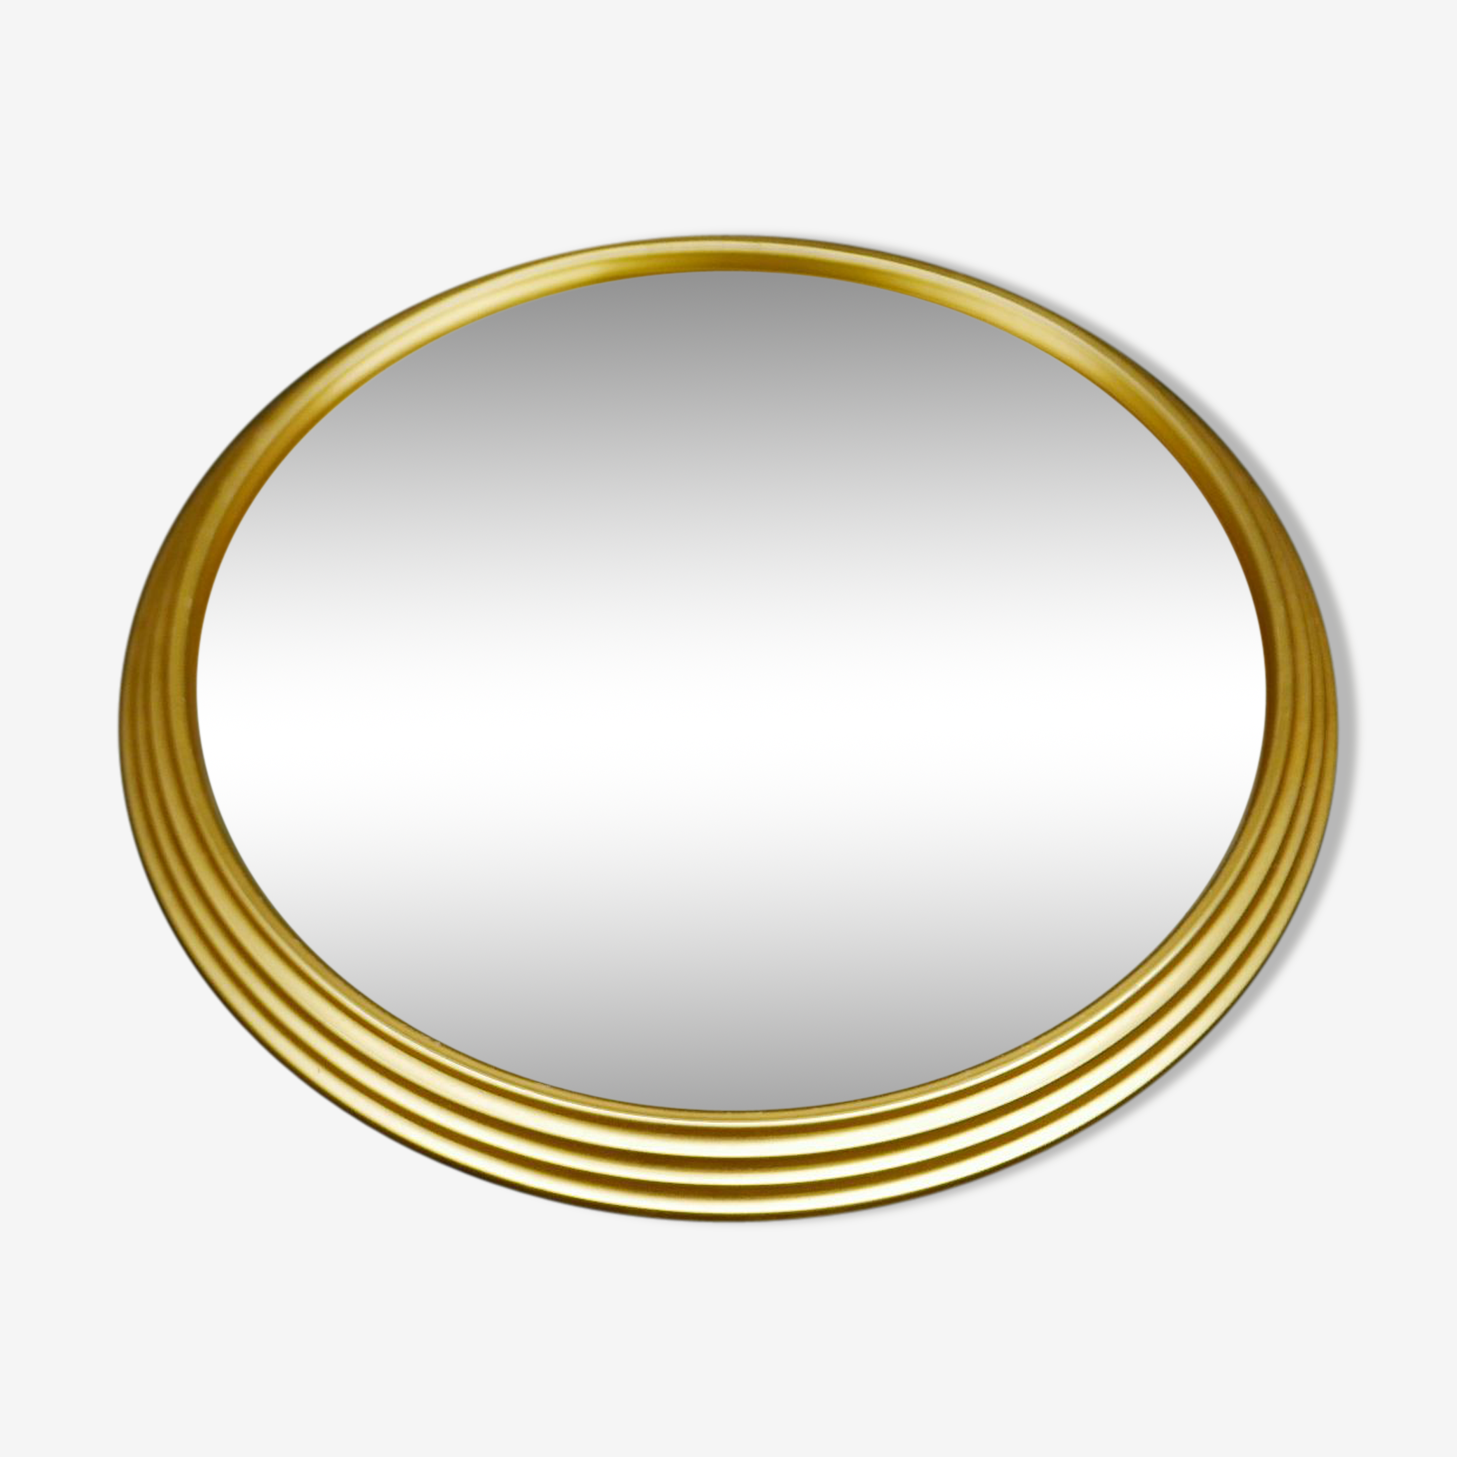 Tray round mirror vintage